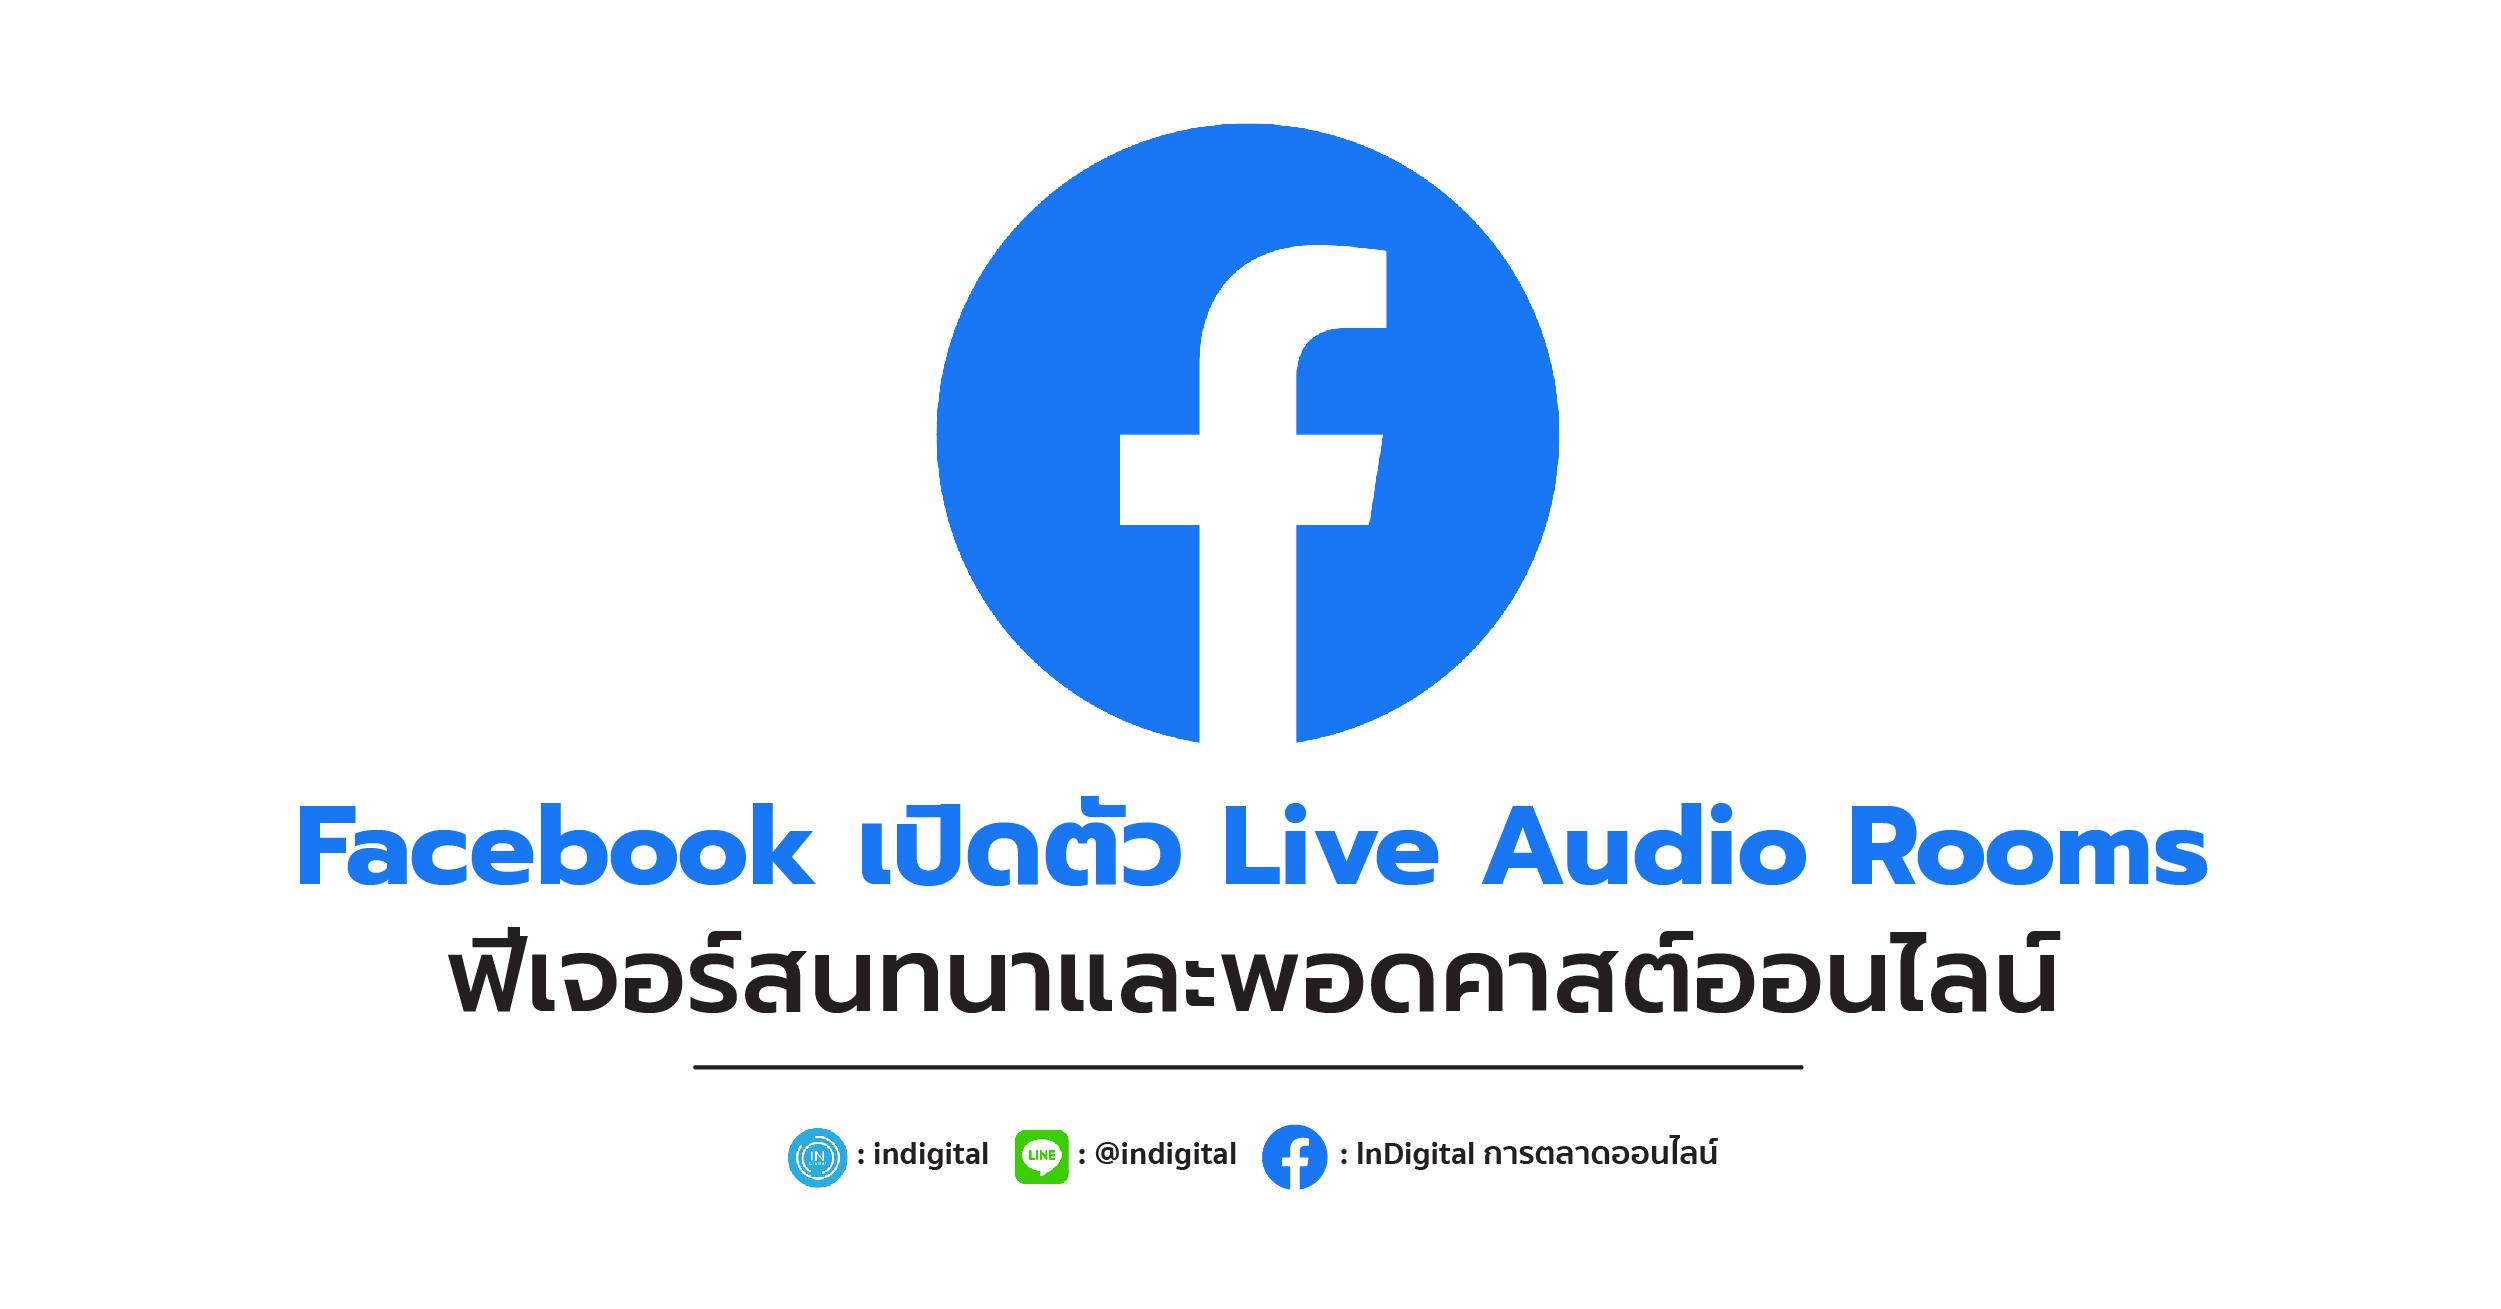 Facebook เปิดตัว Live Audio Rooms ฟีเจอร์สนทนาและพอดคาสต์ออนไลน์